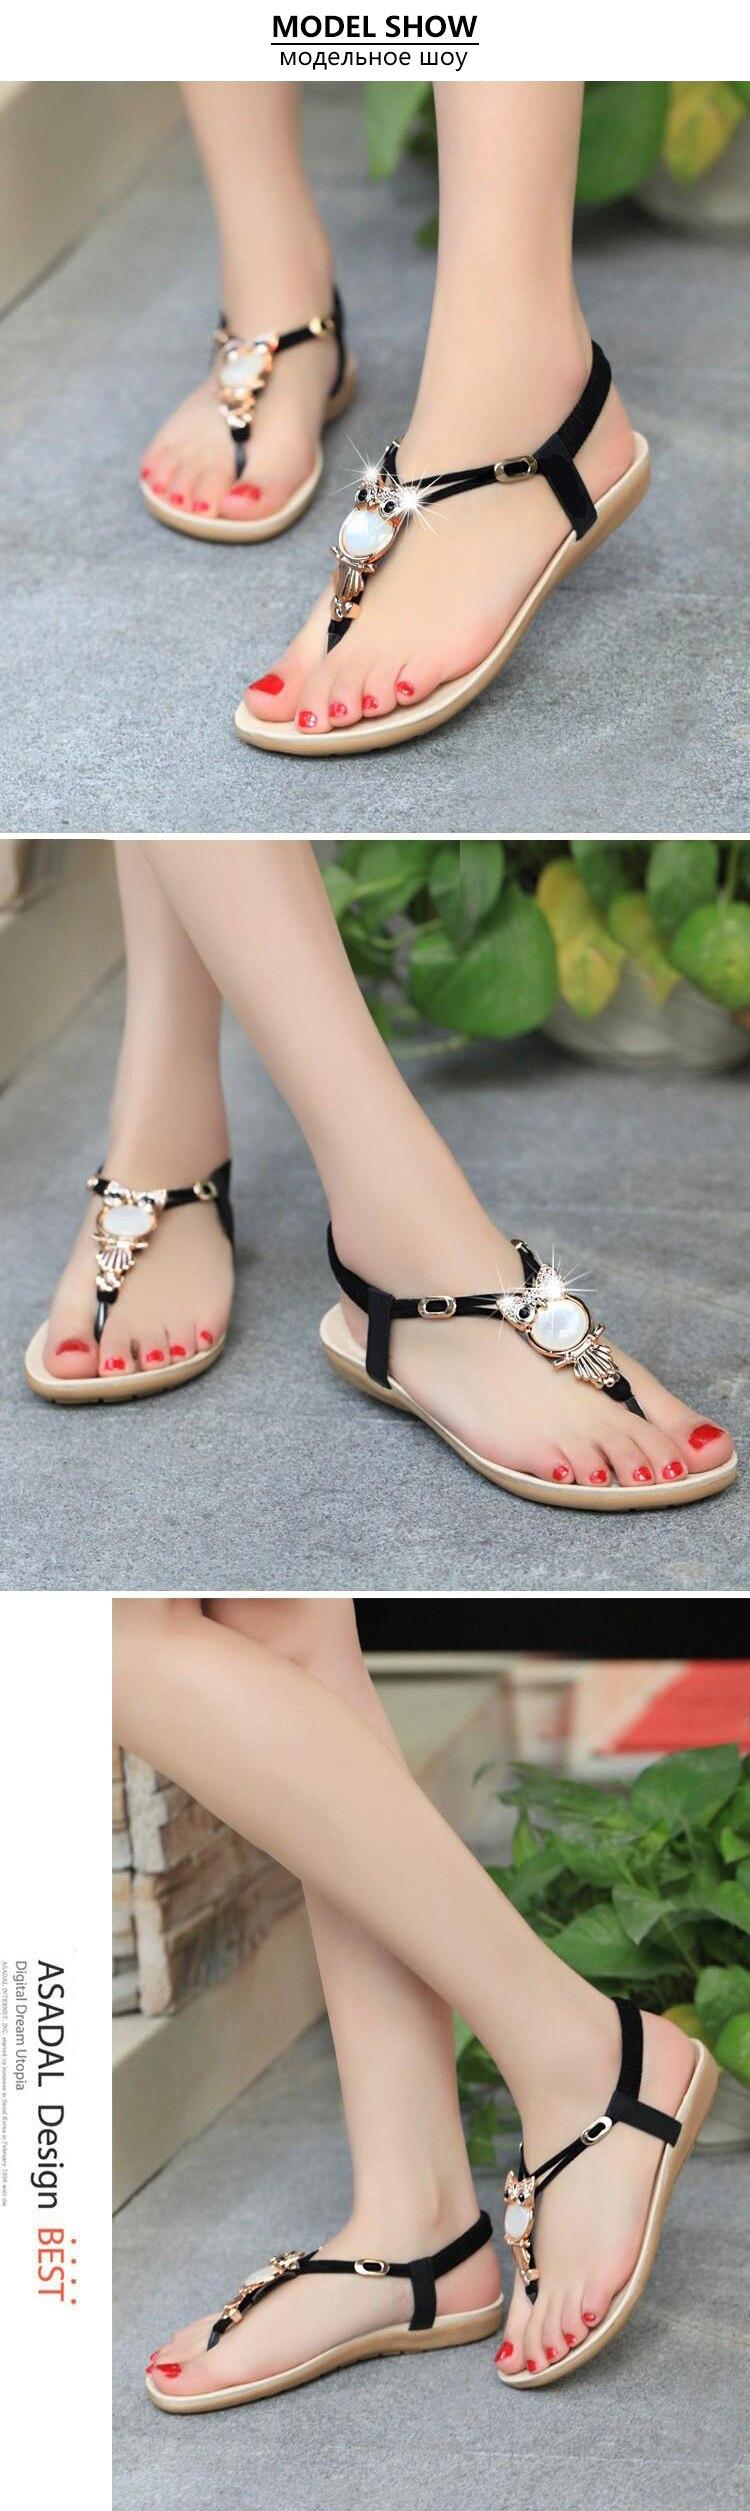 HTB1.L8JkIrI8KJjy0Fhq6zfnpXas Women shoes 2019 hot fashion women sandals elastic t-strap bohemia beaded owl slipper flat sandals women summer shoes flip flop